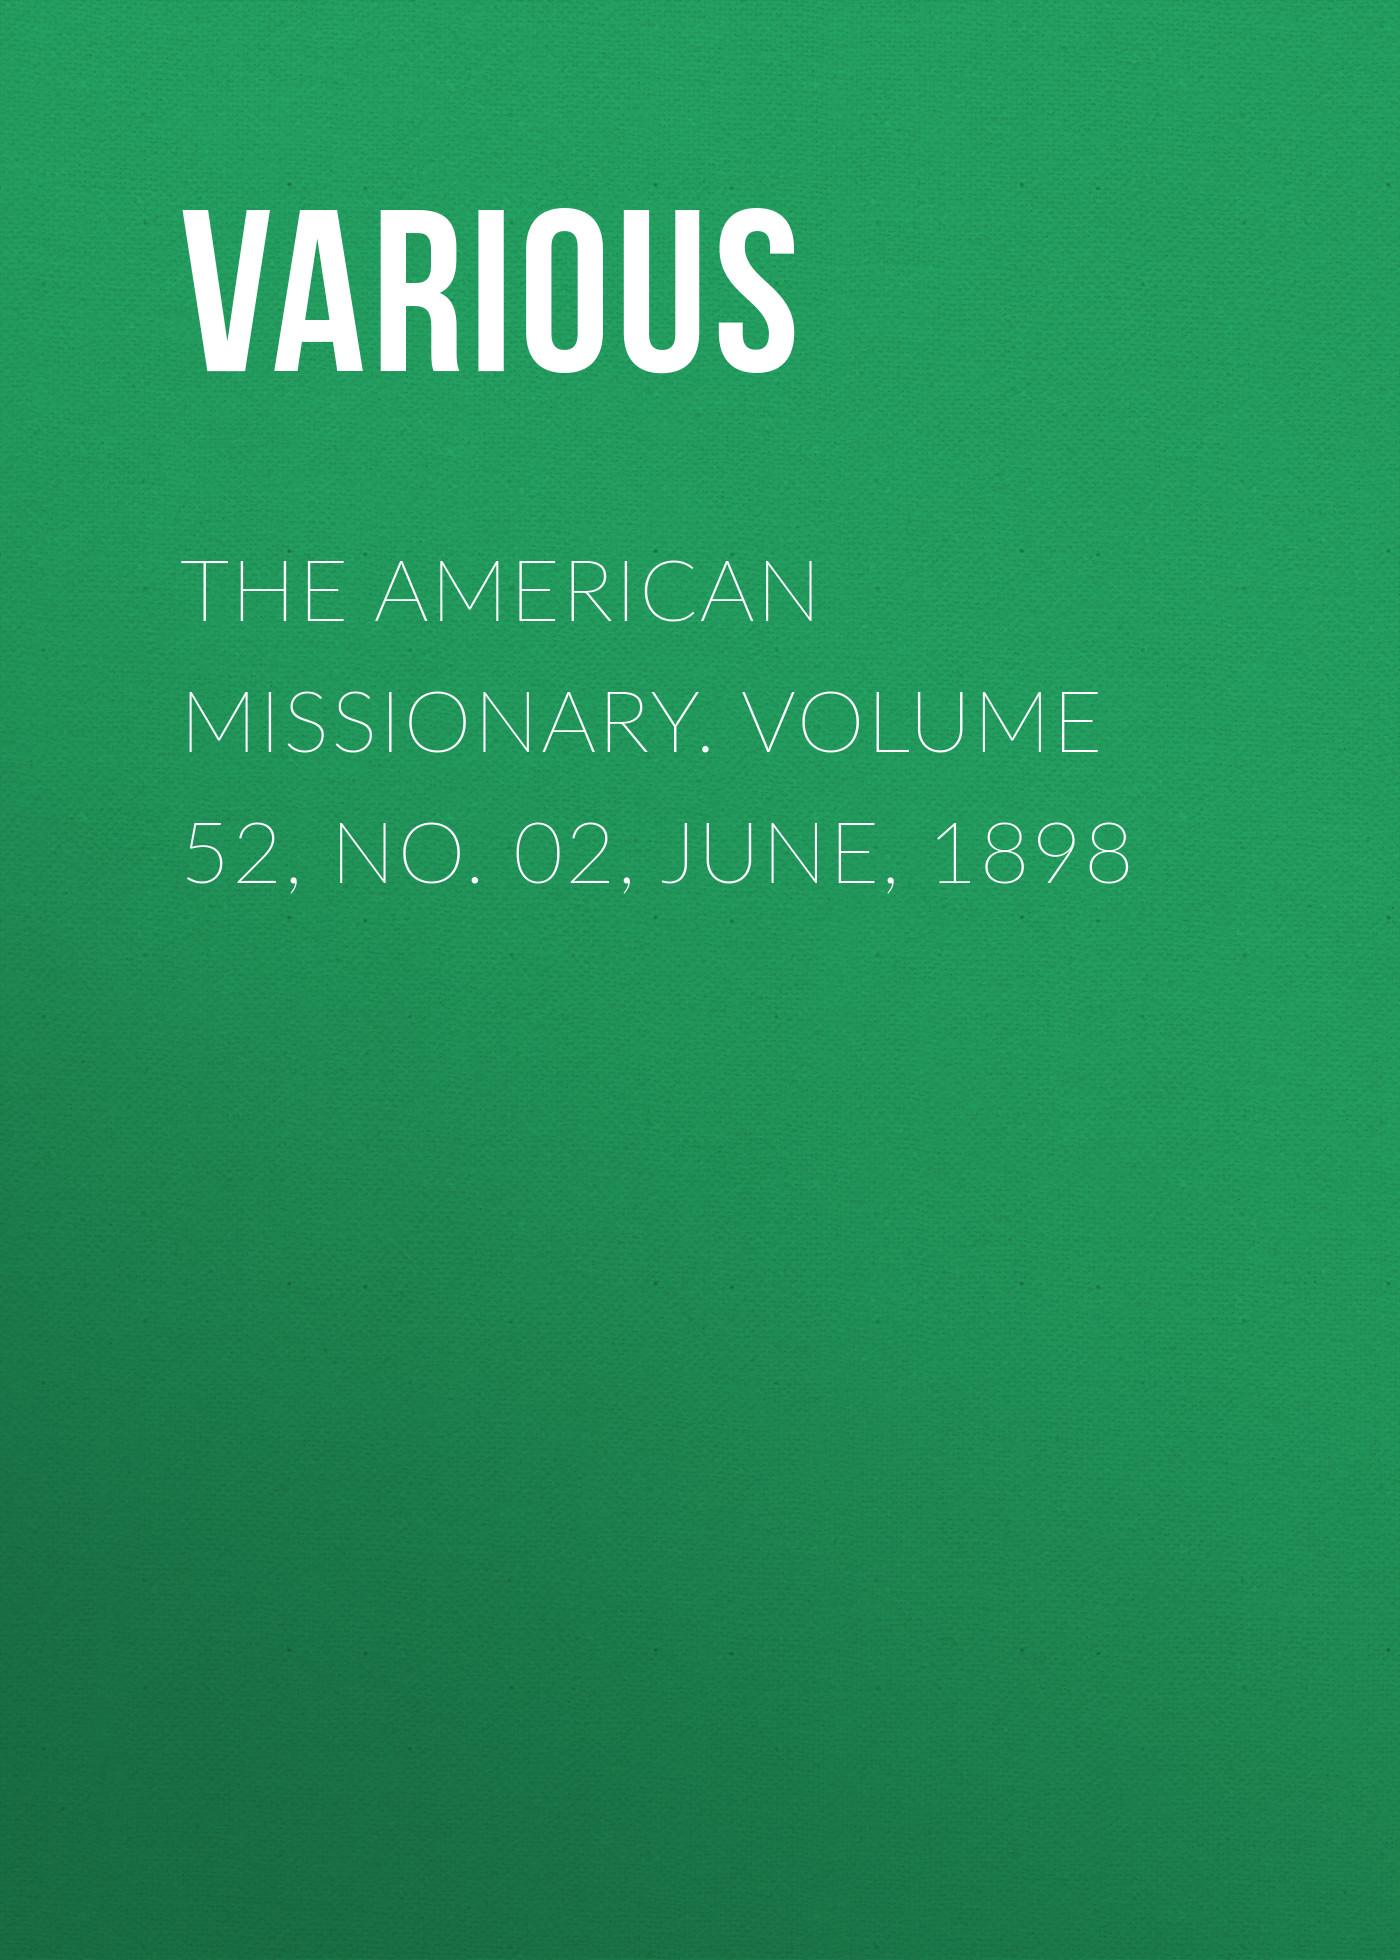 лучшая цена Various The American Missionary. Volume 52, No. 02, June, 1898